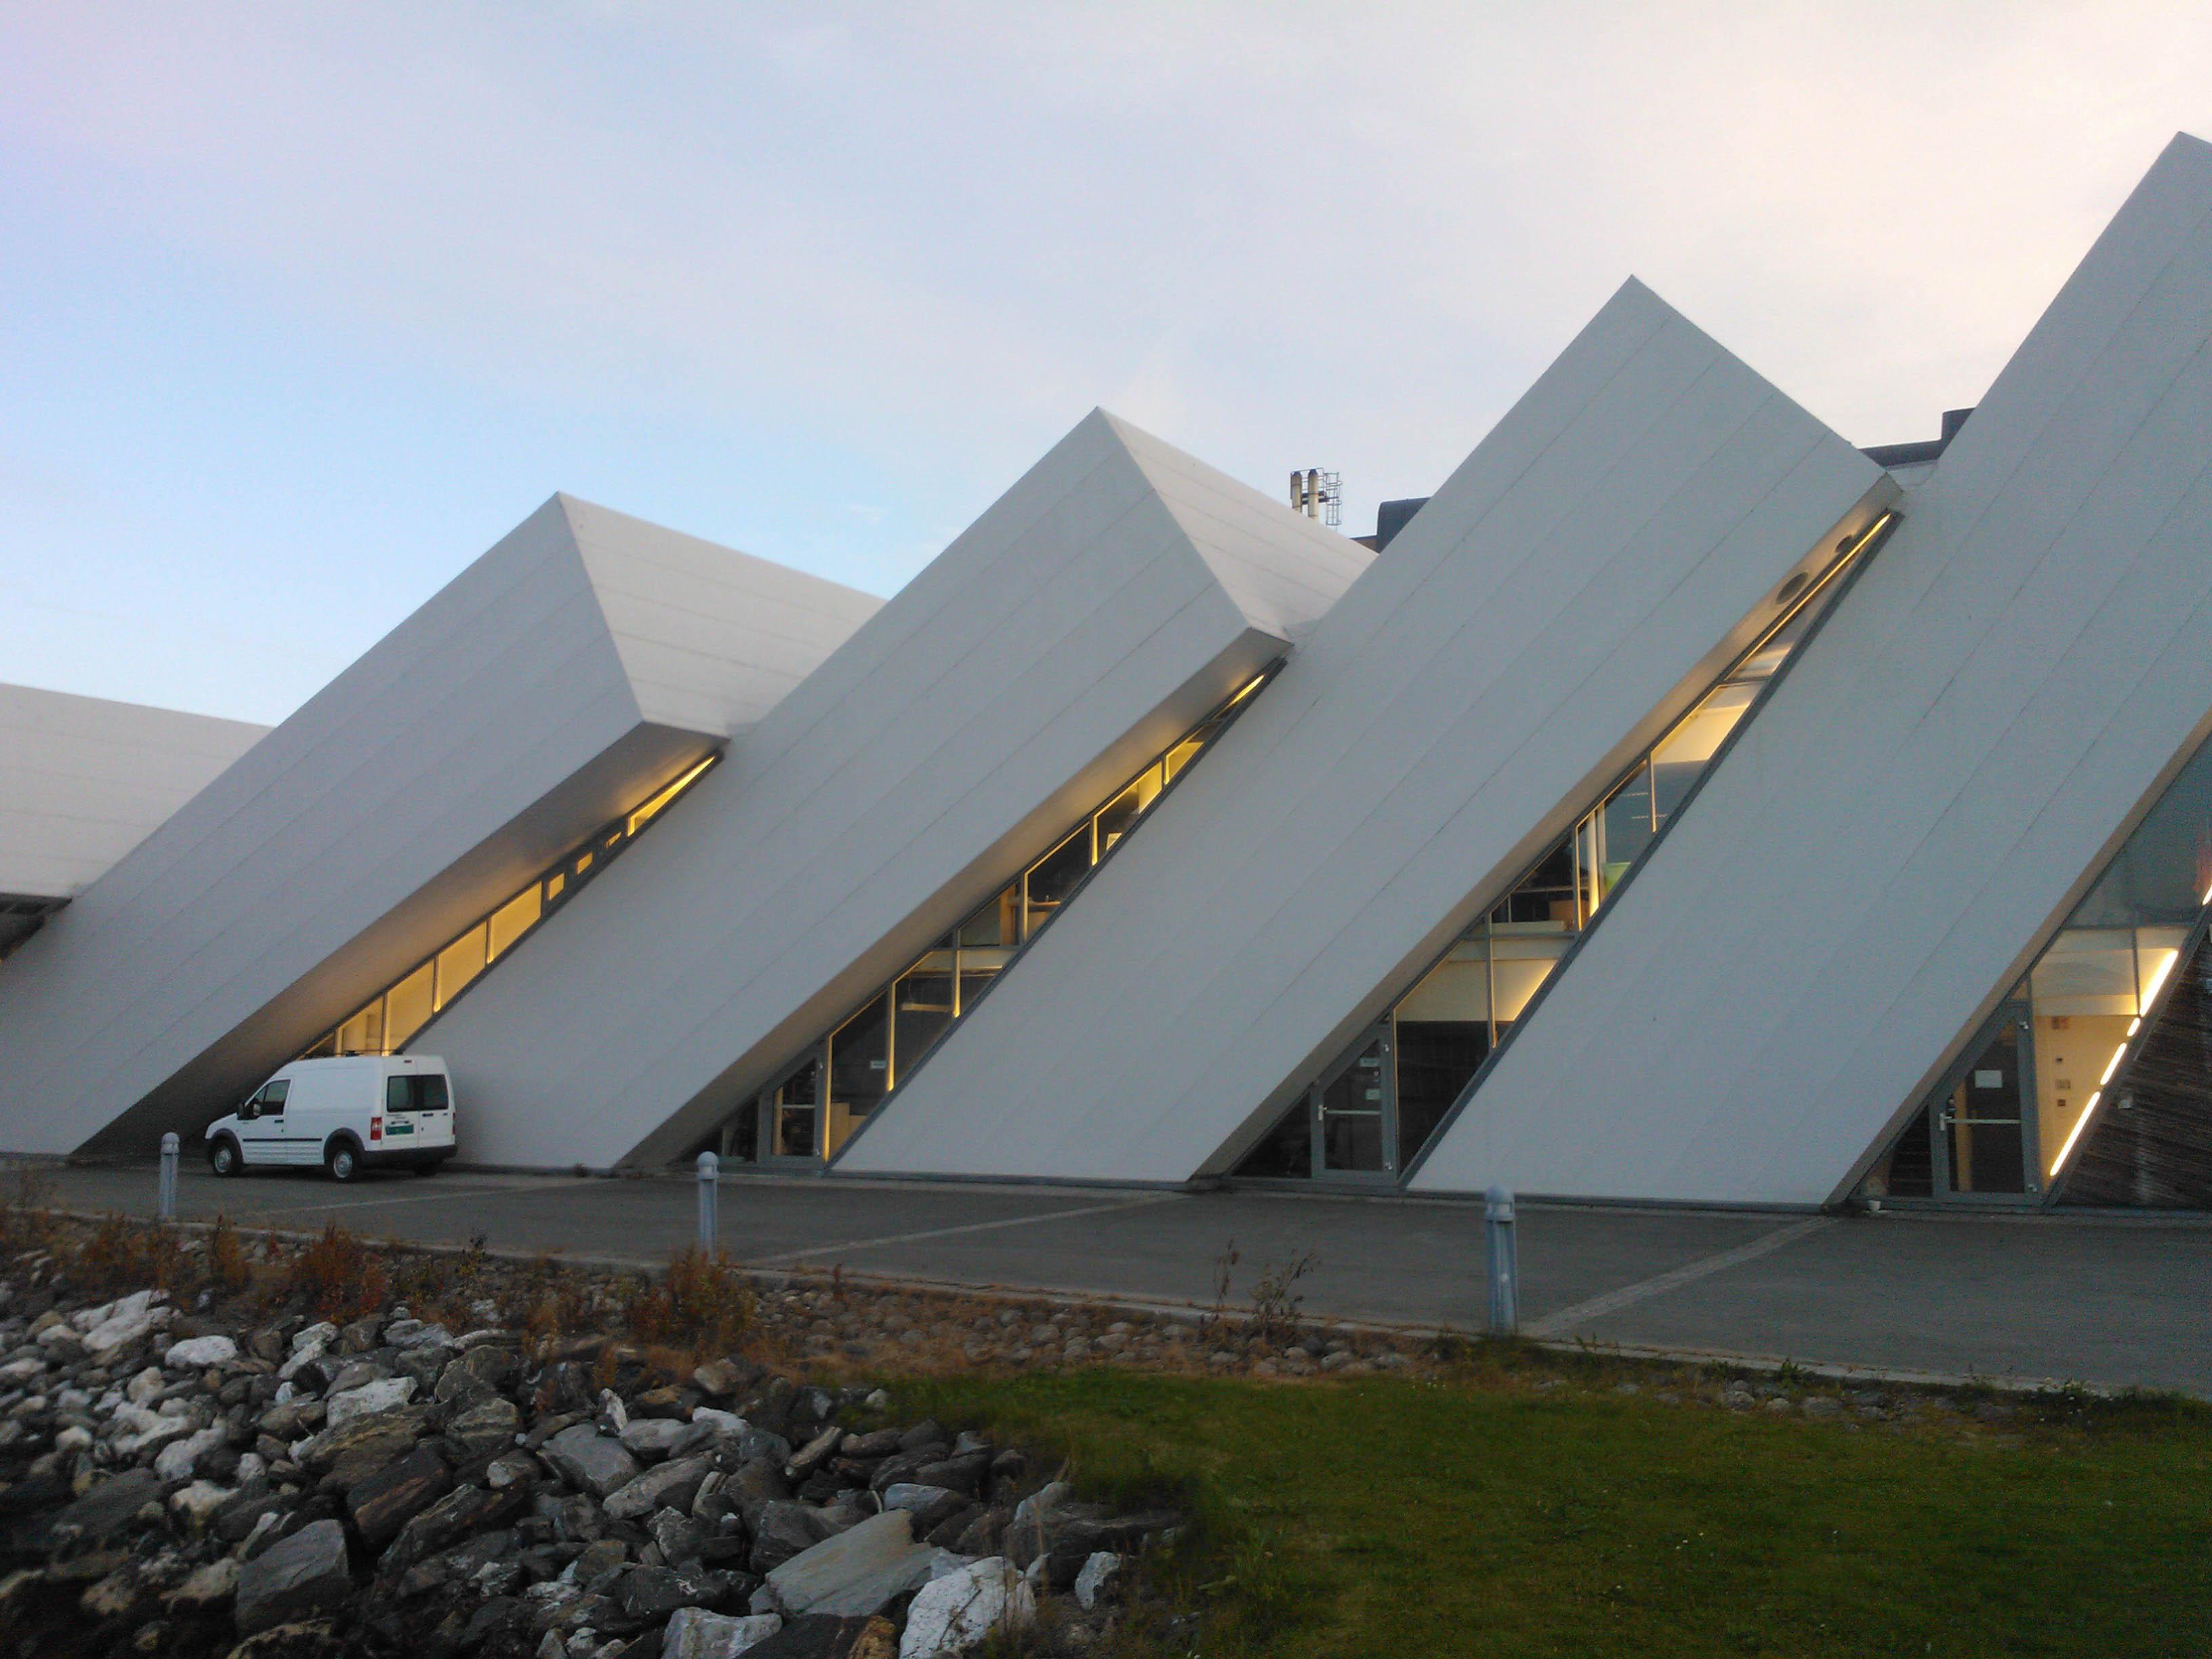 Polaria museum, Tromsø, Norway